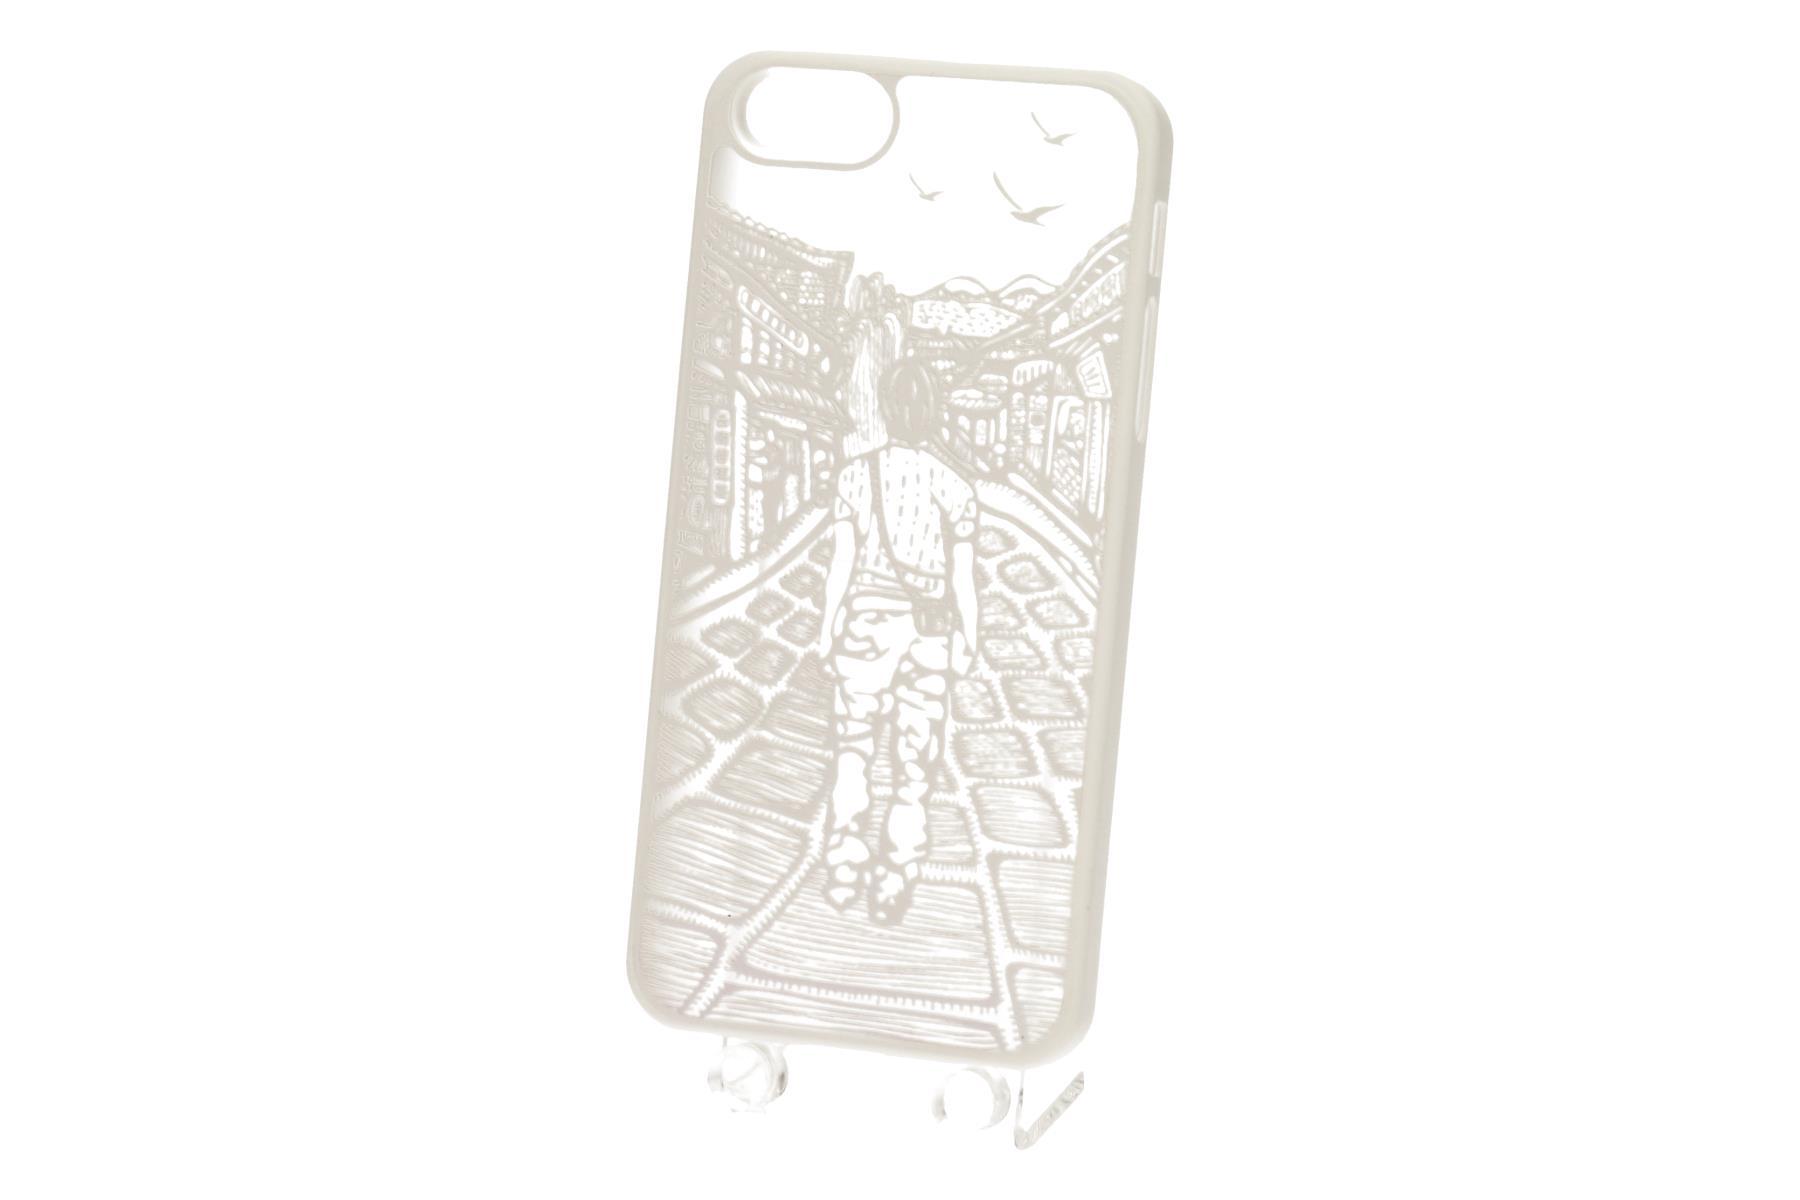 TB Touch pouzdro pro Iphone 5/5S bílá